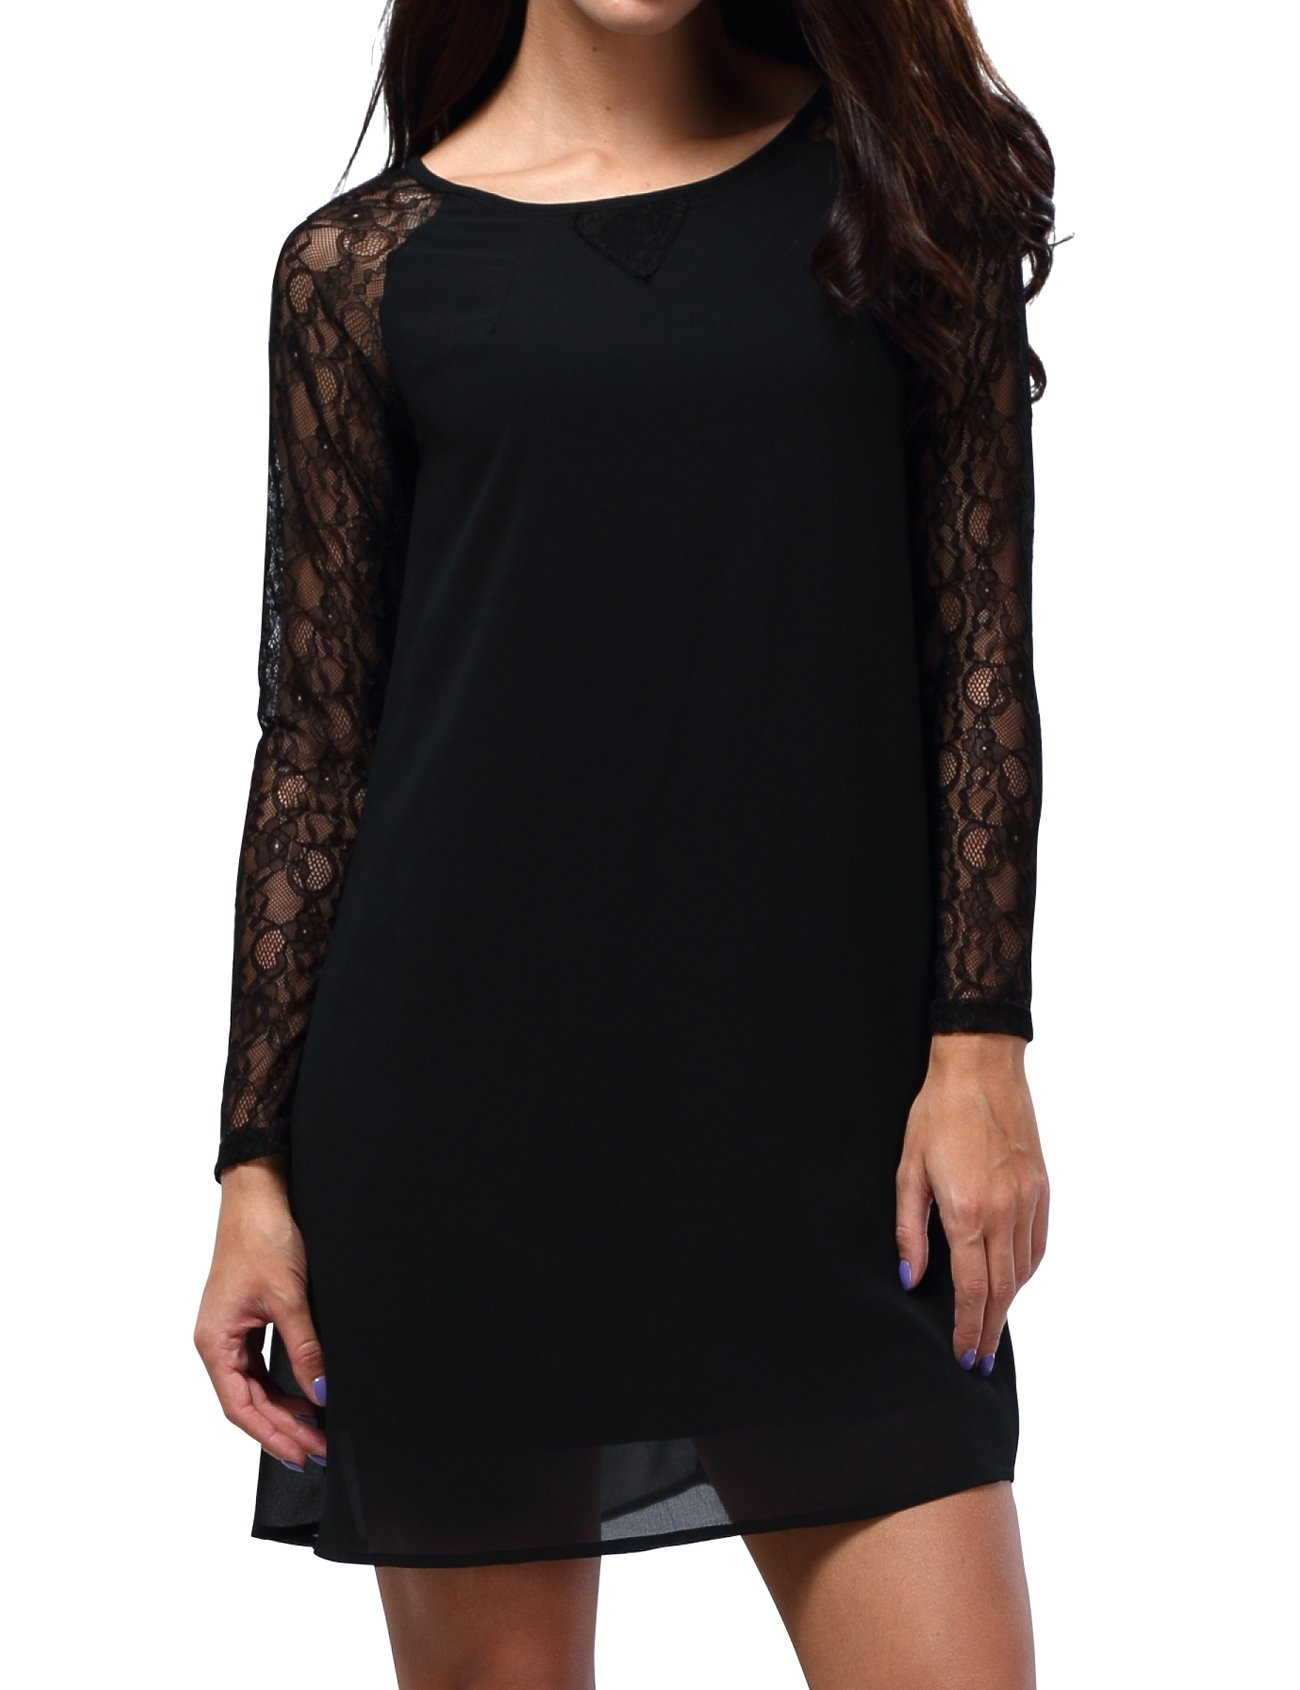 Bepei Women Lace In Point Black Lace Shift Dress S